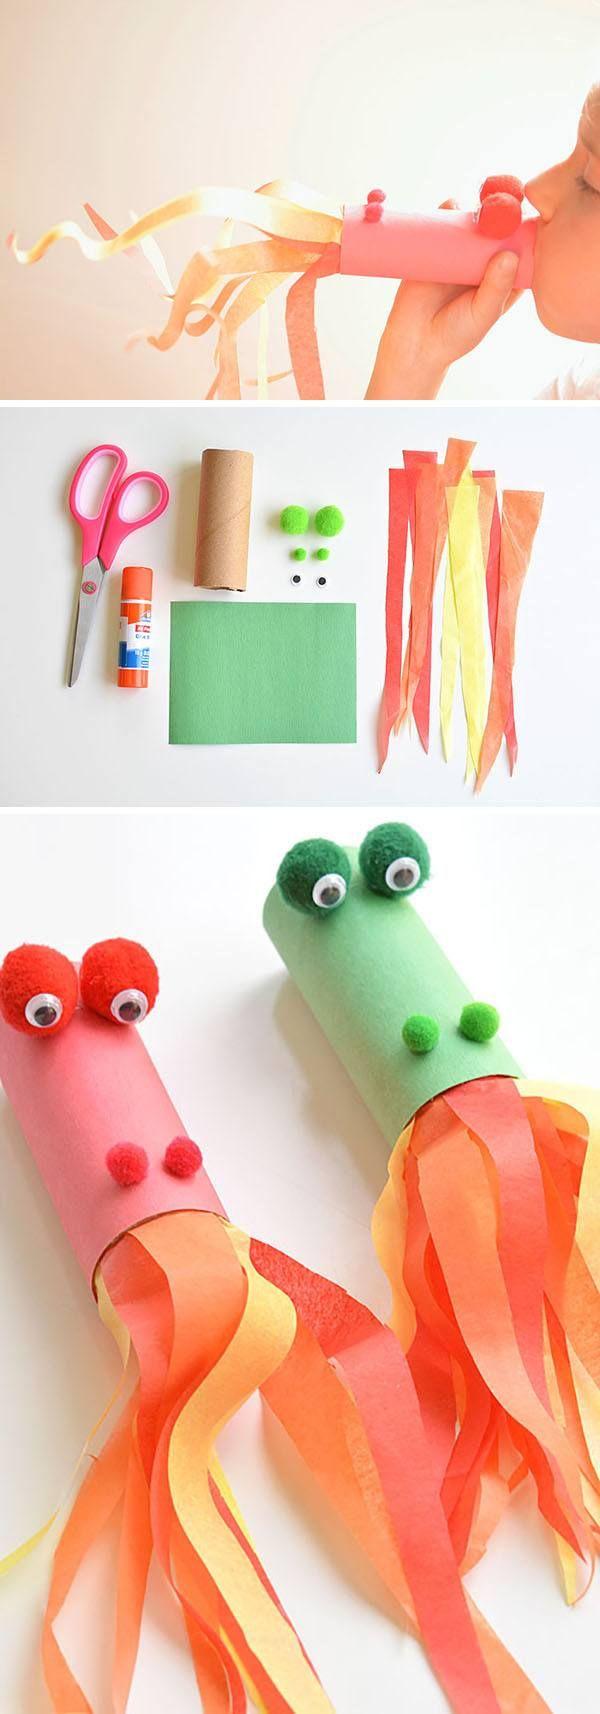 Best 25+ Toilet paper roll crafts ideas on Pinterest ...